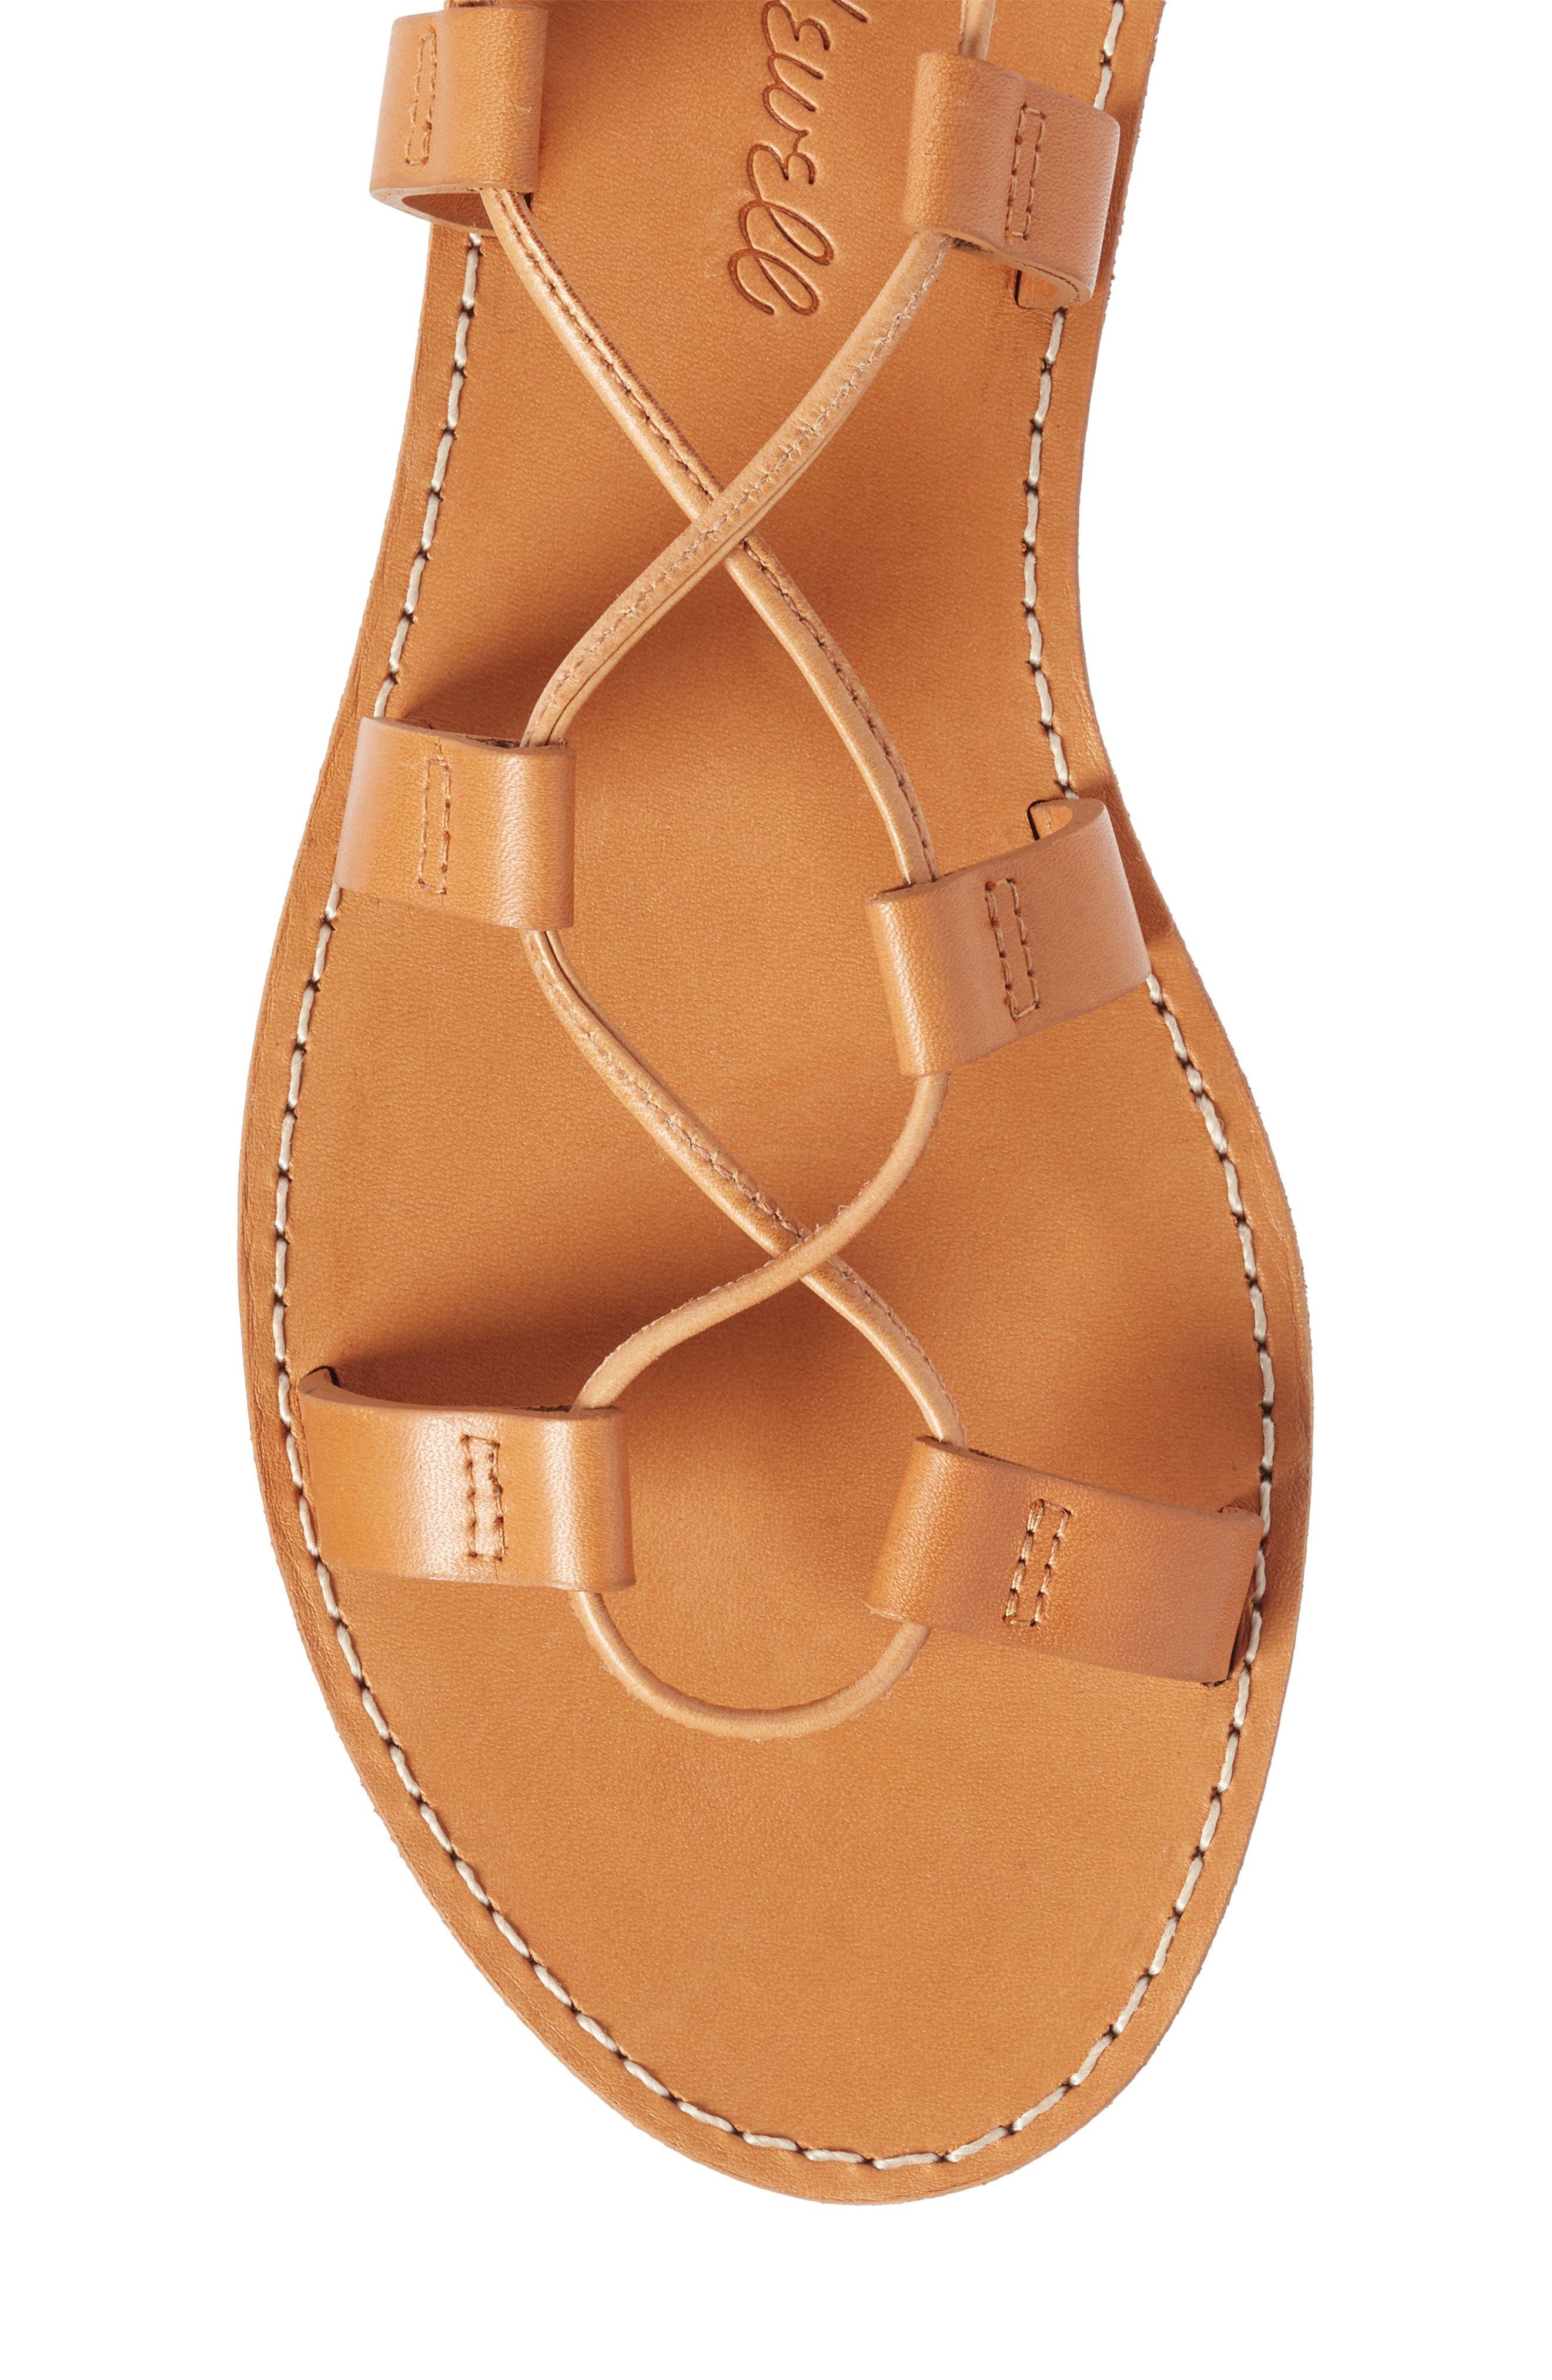 The Boardwalk Lace-Up Sandal,                             Alternate thumbnail 5, color,                             DESERT CAMEL LEATHER